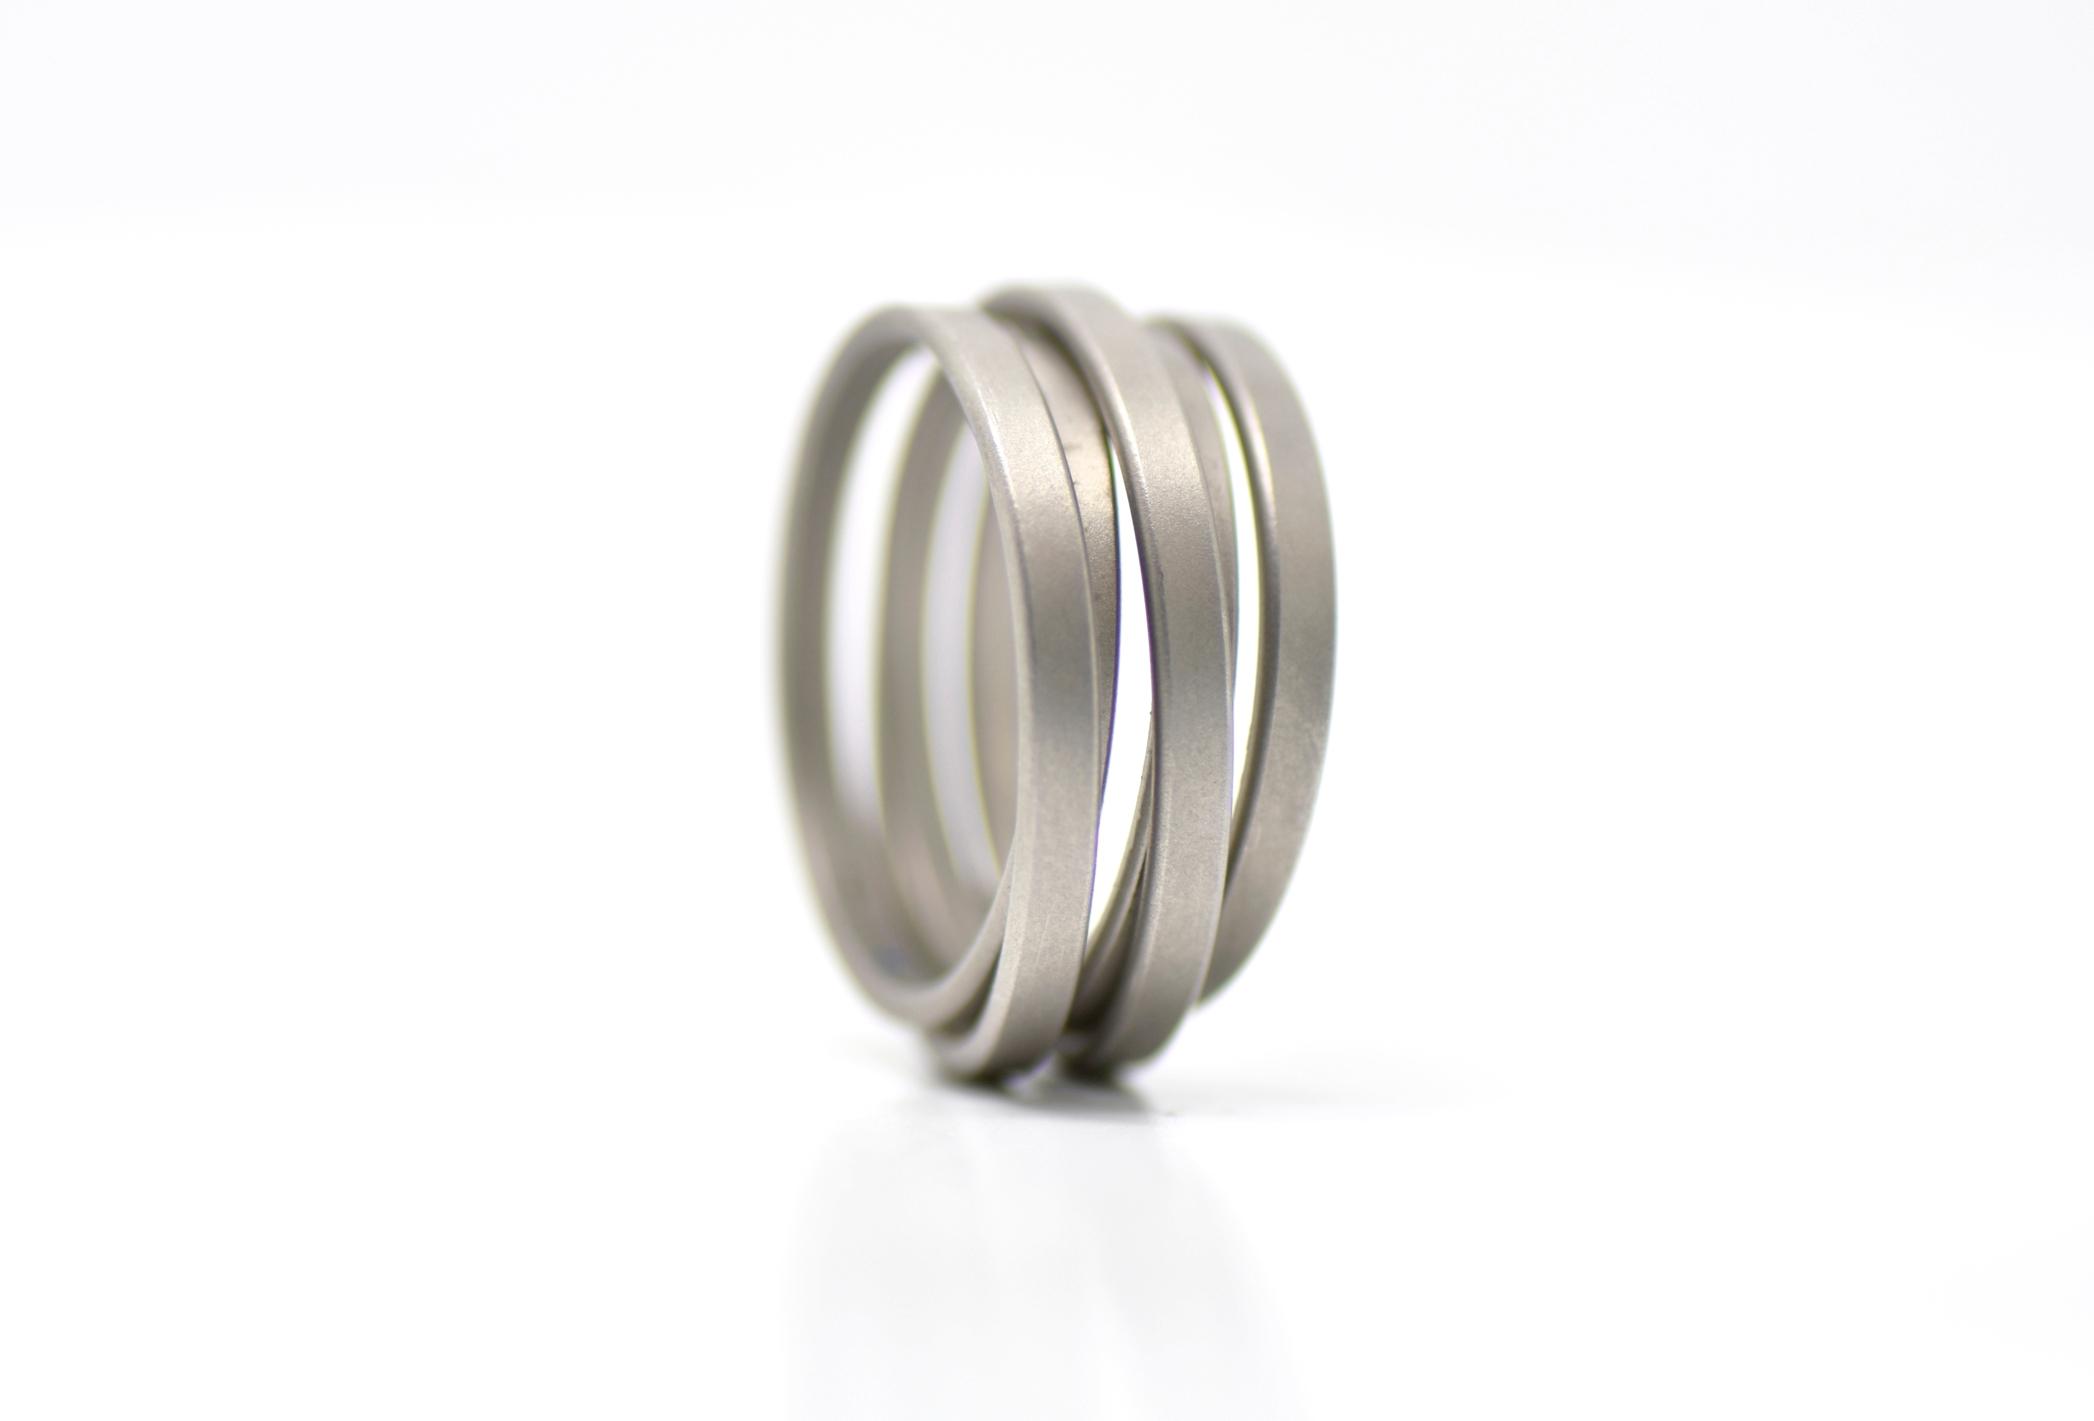 SATURN matt brushed stainless steel 5 ring